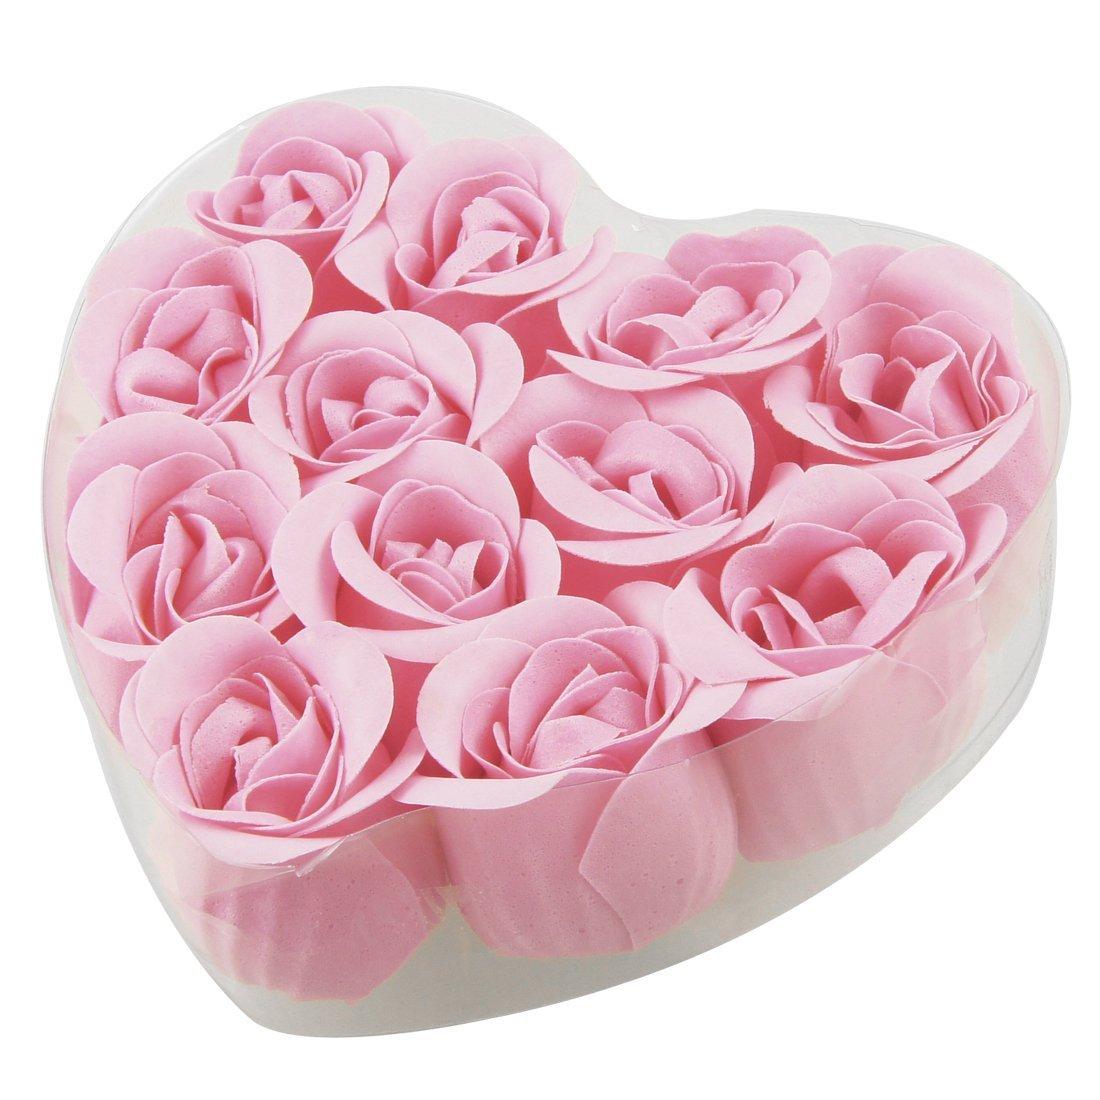 WSFS Hot Sale 12 Pcs Bathing Pink Rose Bud Flower Petal Soap + Heart Shape Box(China (Mainland))